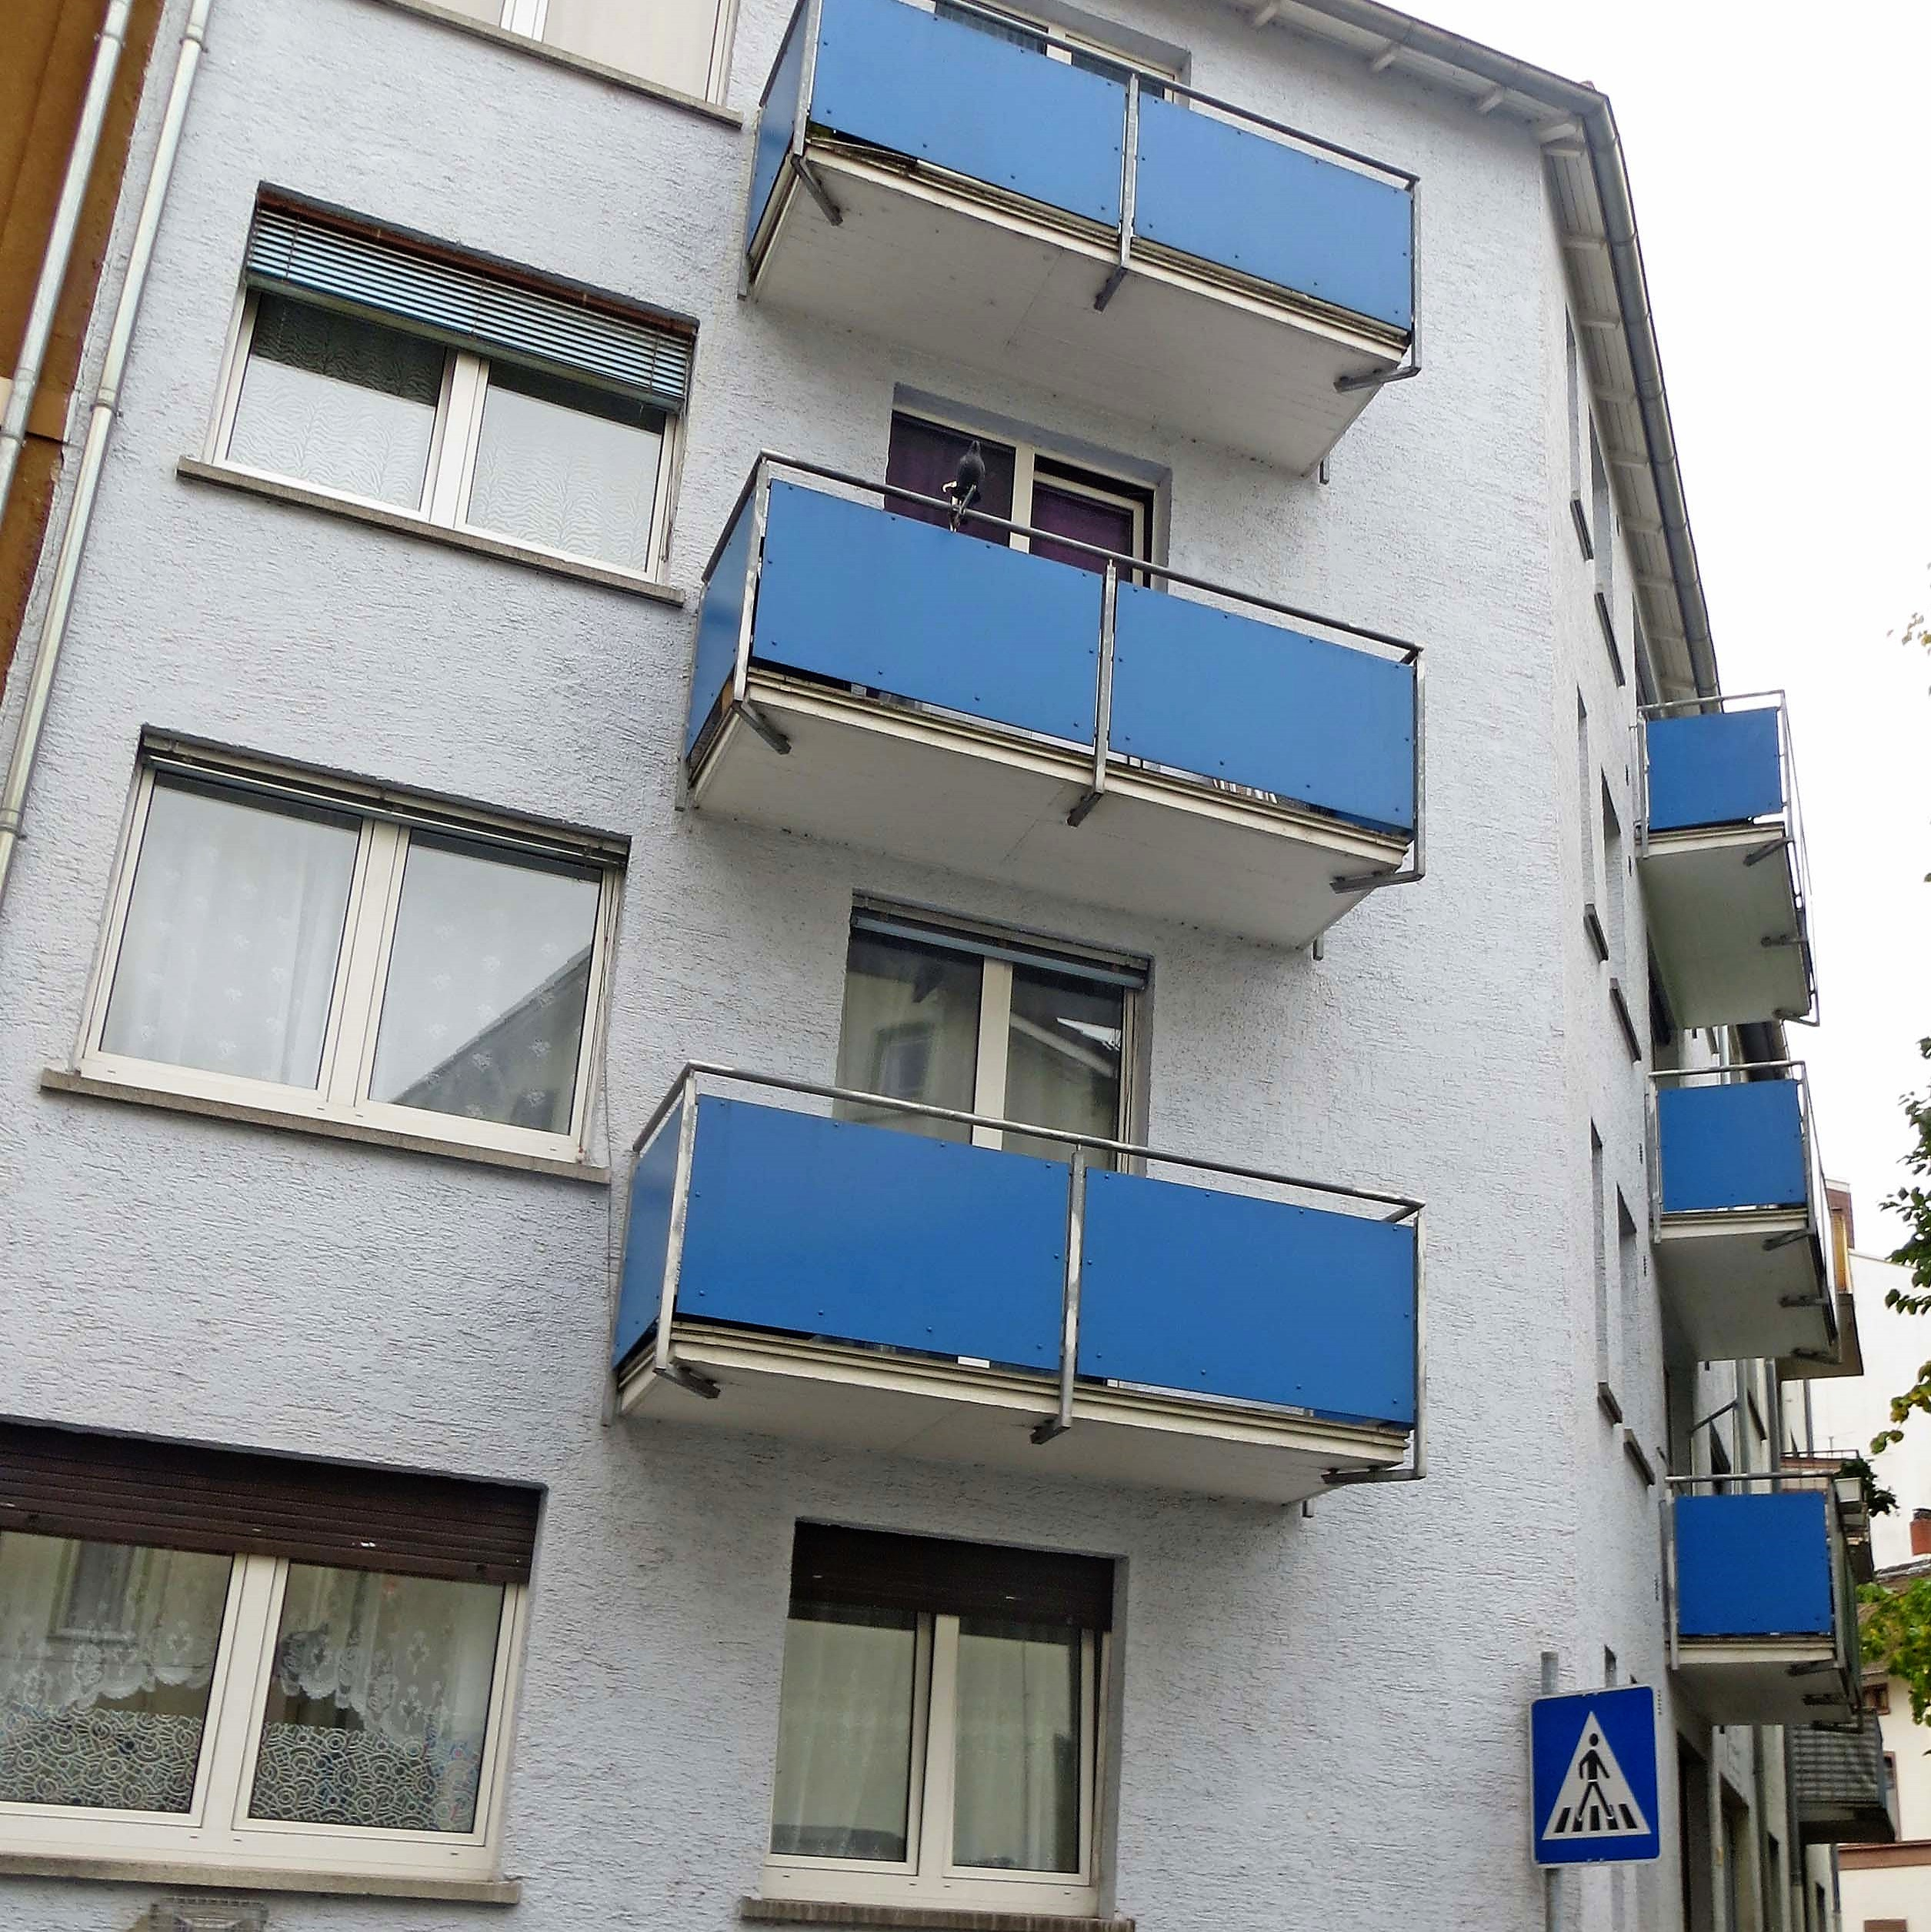 Mehrfamilienhäuser mit Hinterhaus